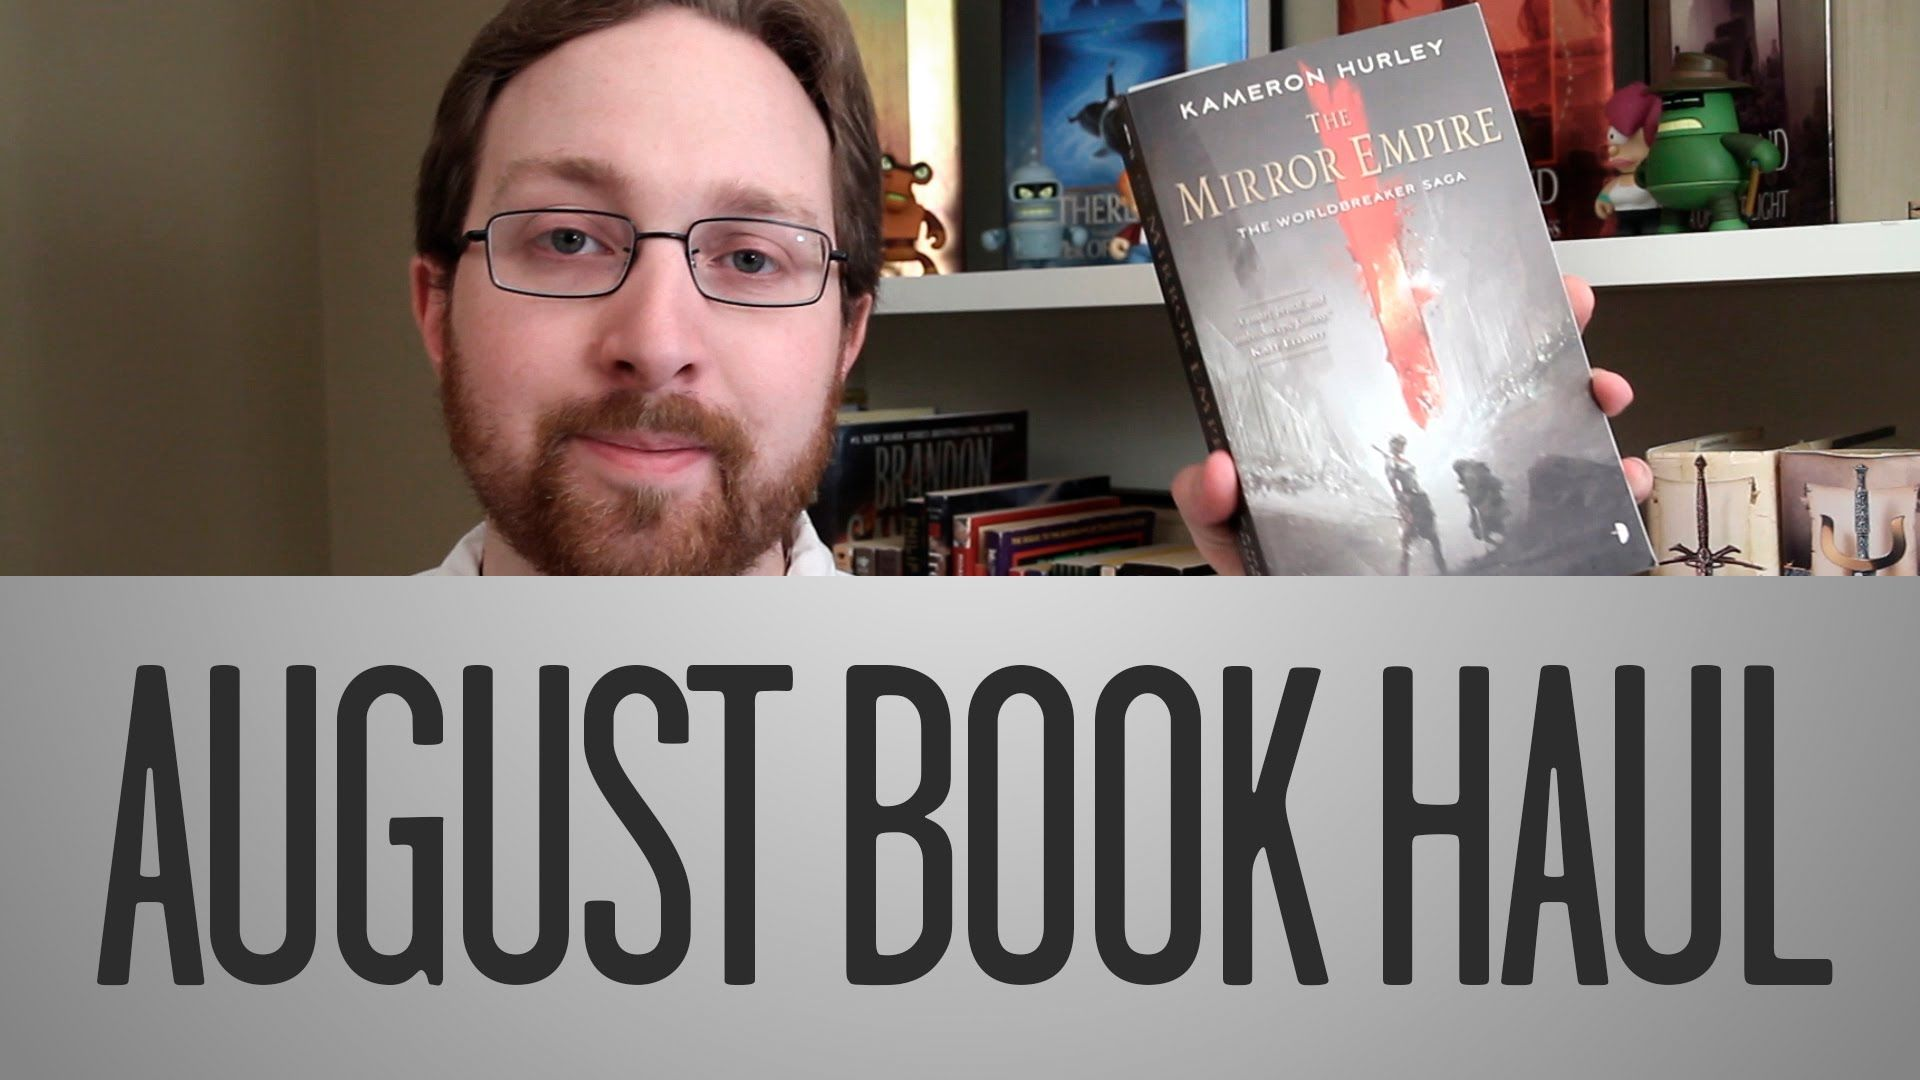 Let's Read - August Book Haul